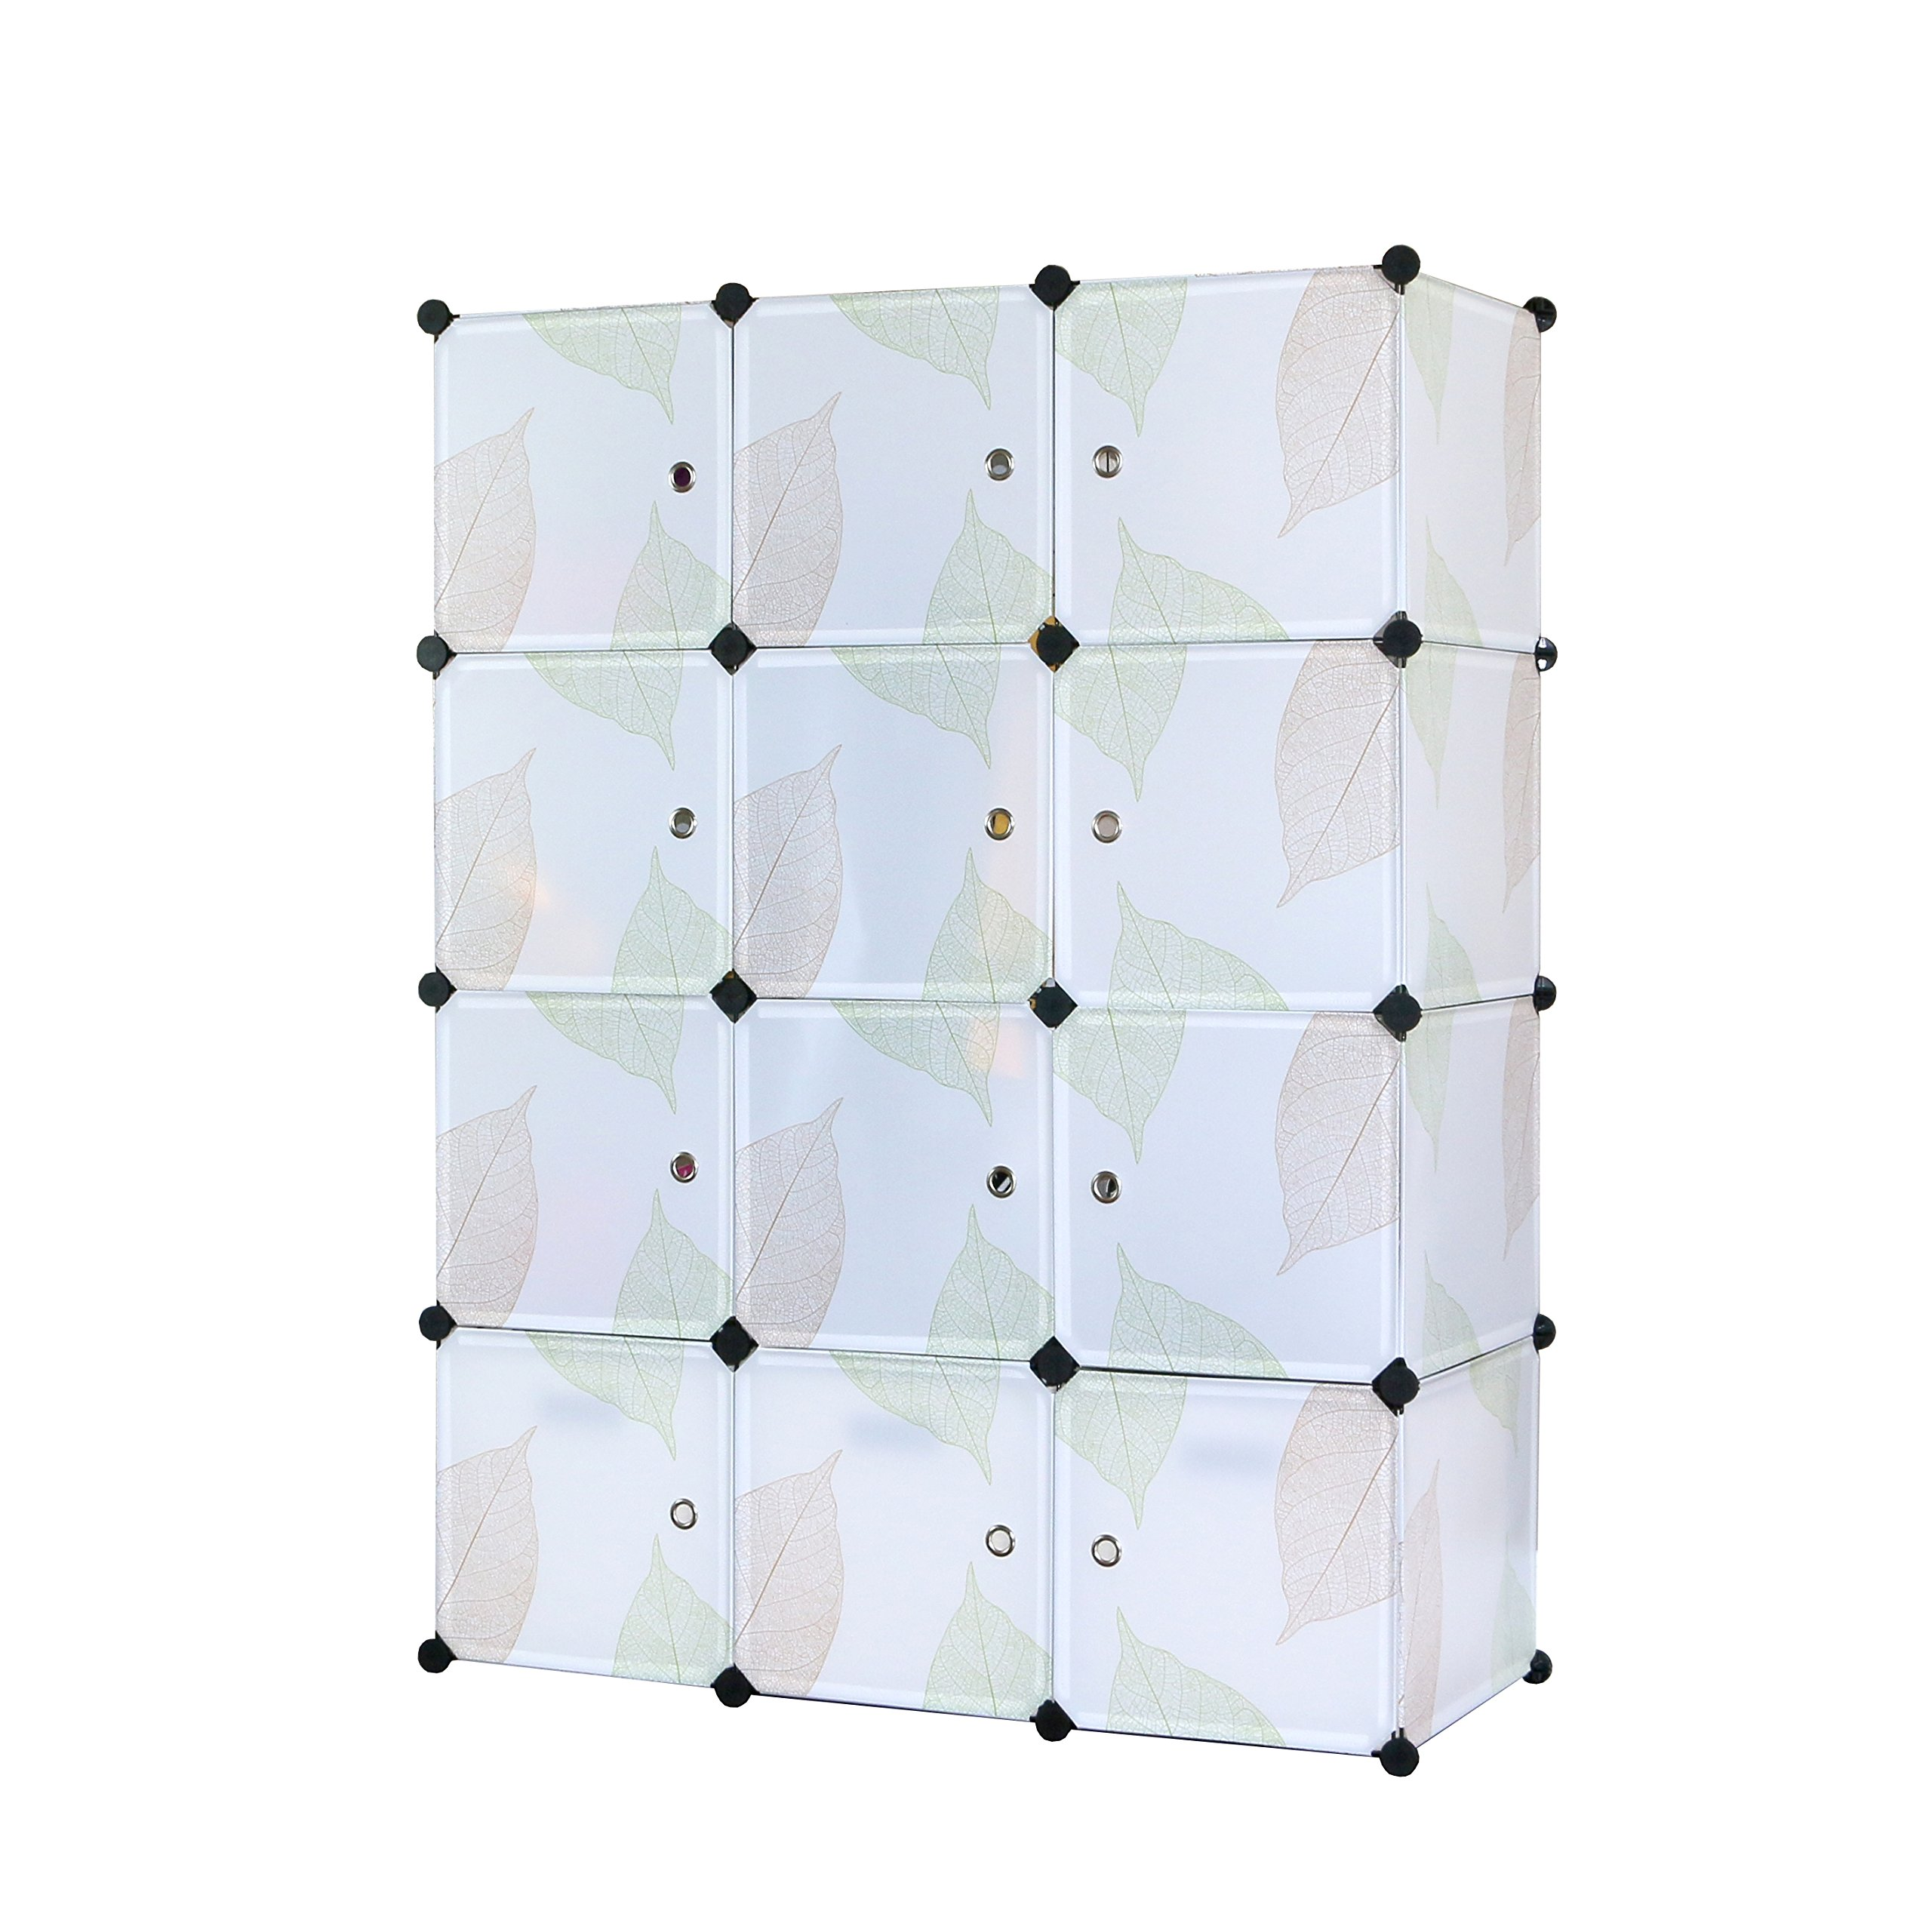 UNICOO - DIY 12 Cube Organizer, Bookcase, Toy Organizer, Storage Cabinet, Wardrobe Closet (Regular, Green Leaves) by UNICOO